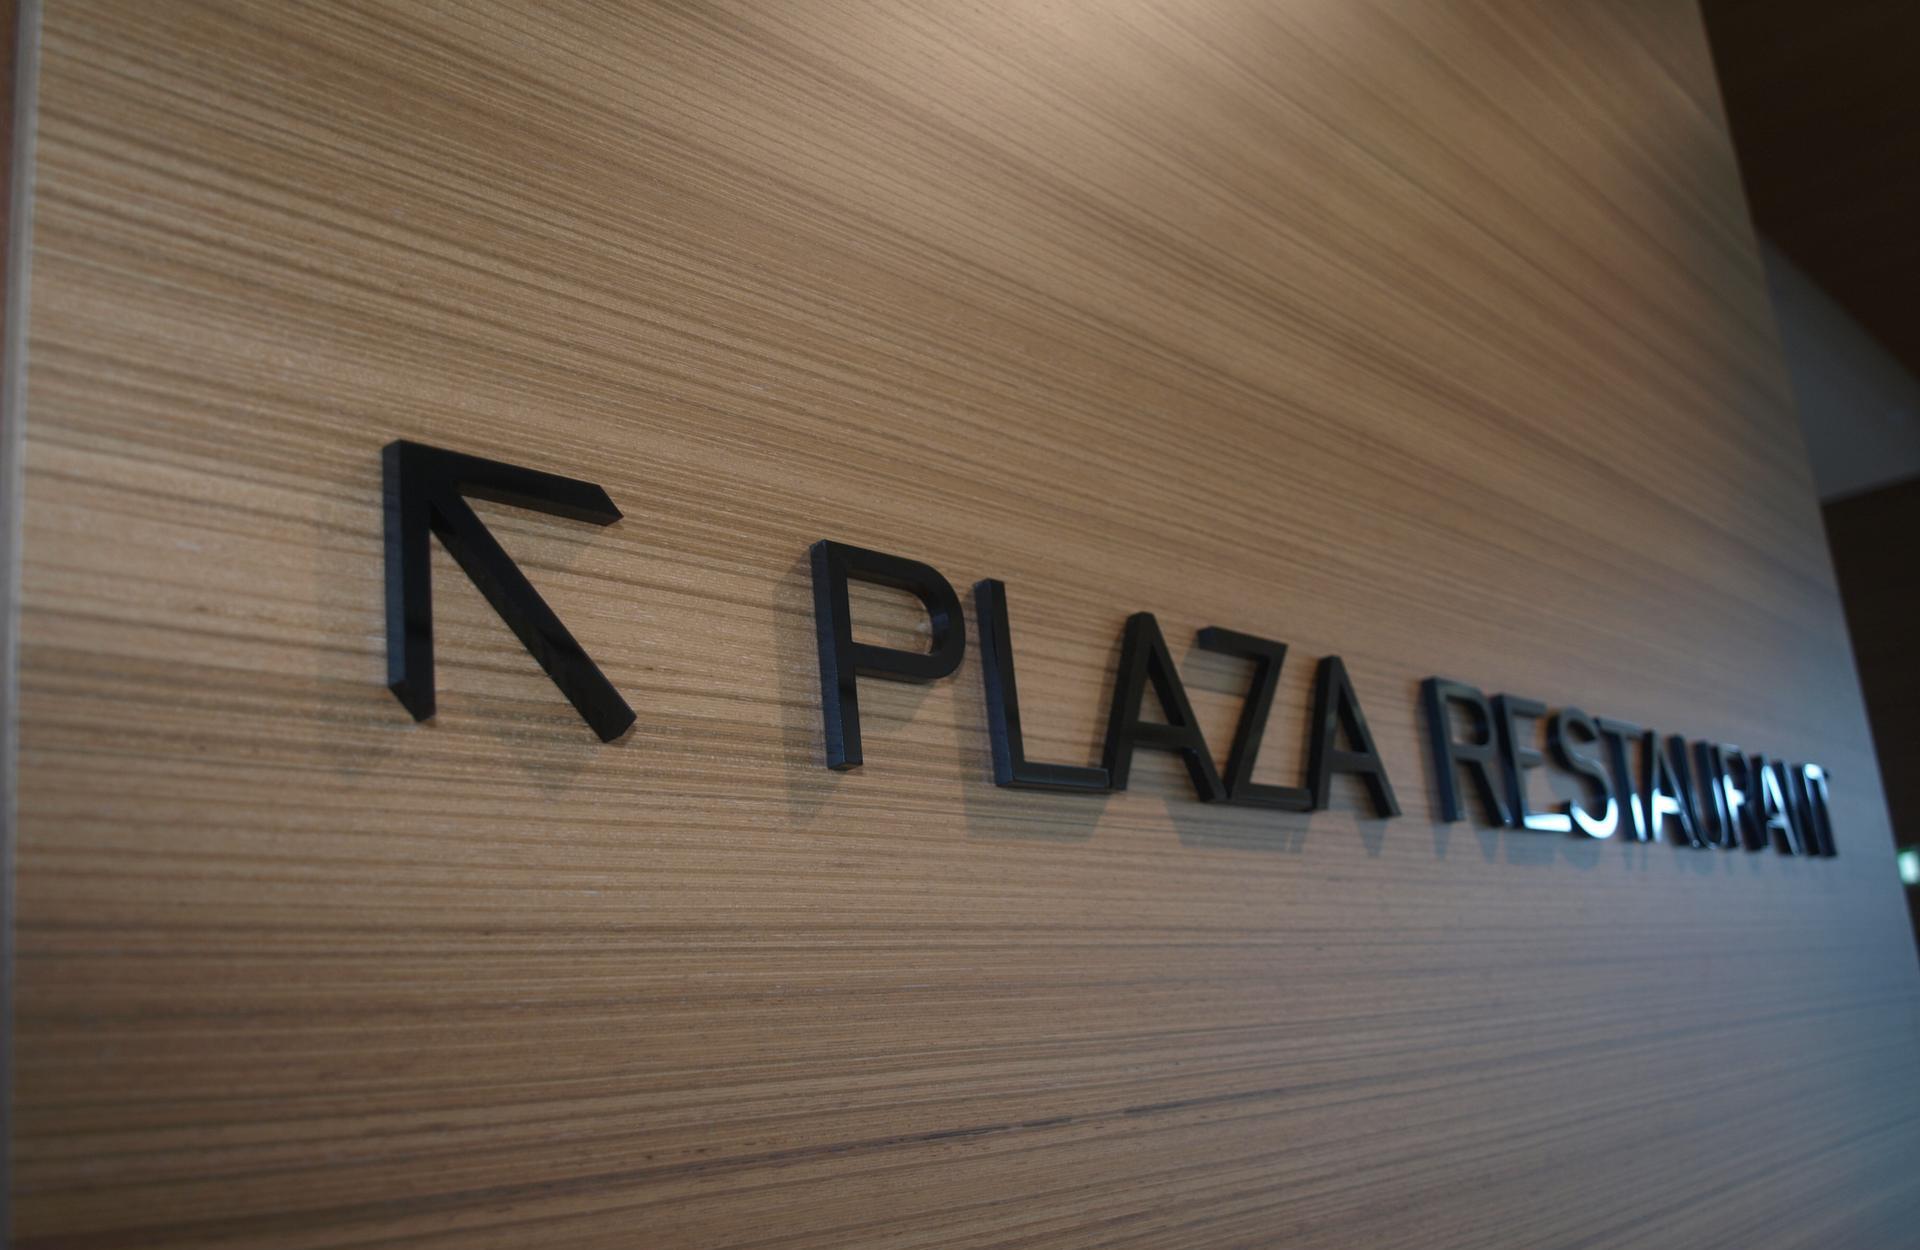 3D letter signs